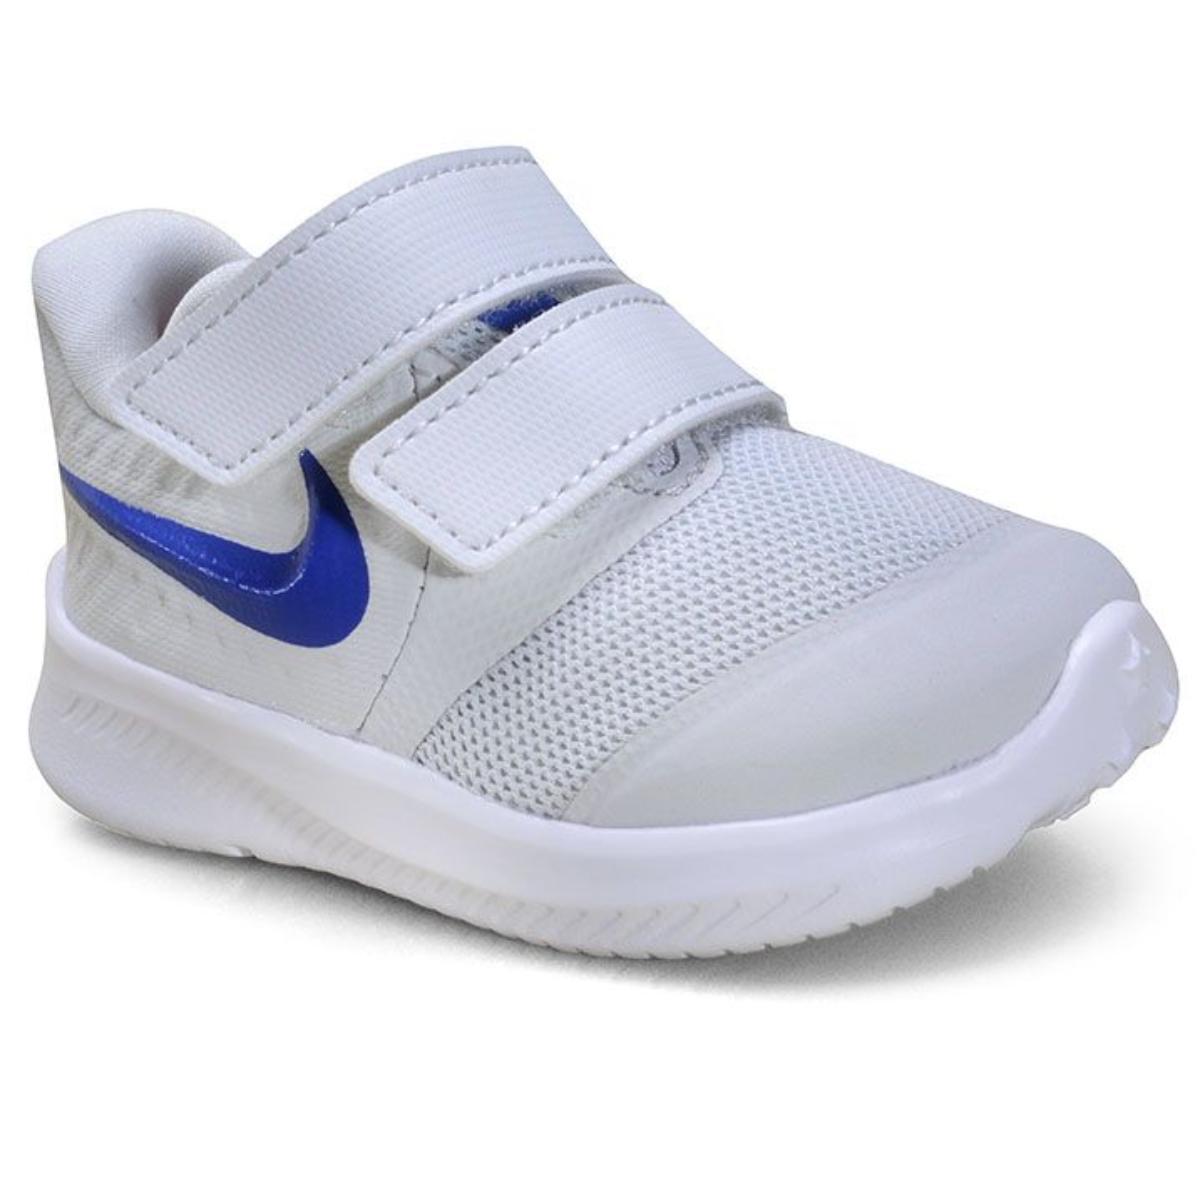 Tênis Masc Infantil Nike At1803-013 Star Runner 2 Cinza/azul